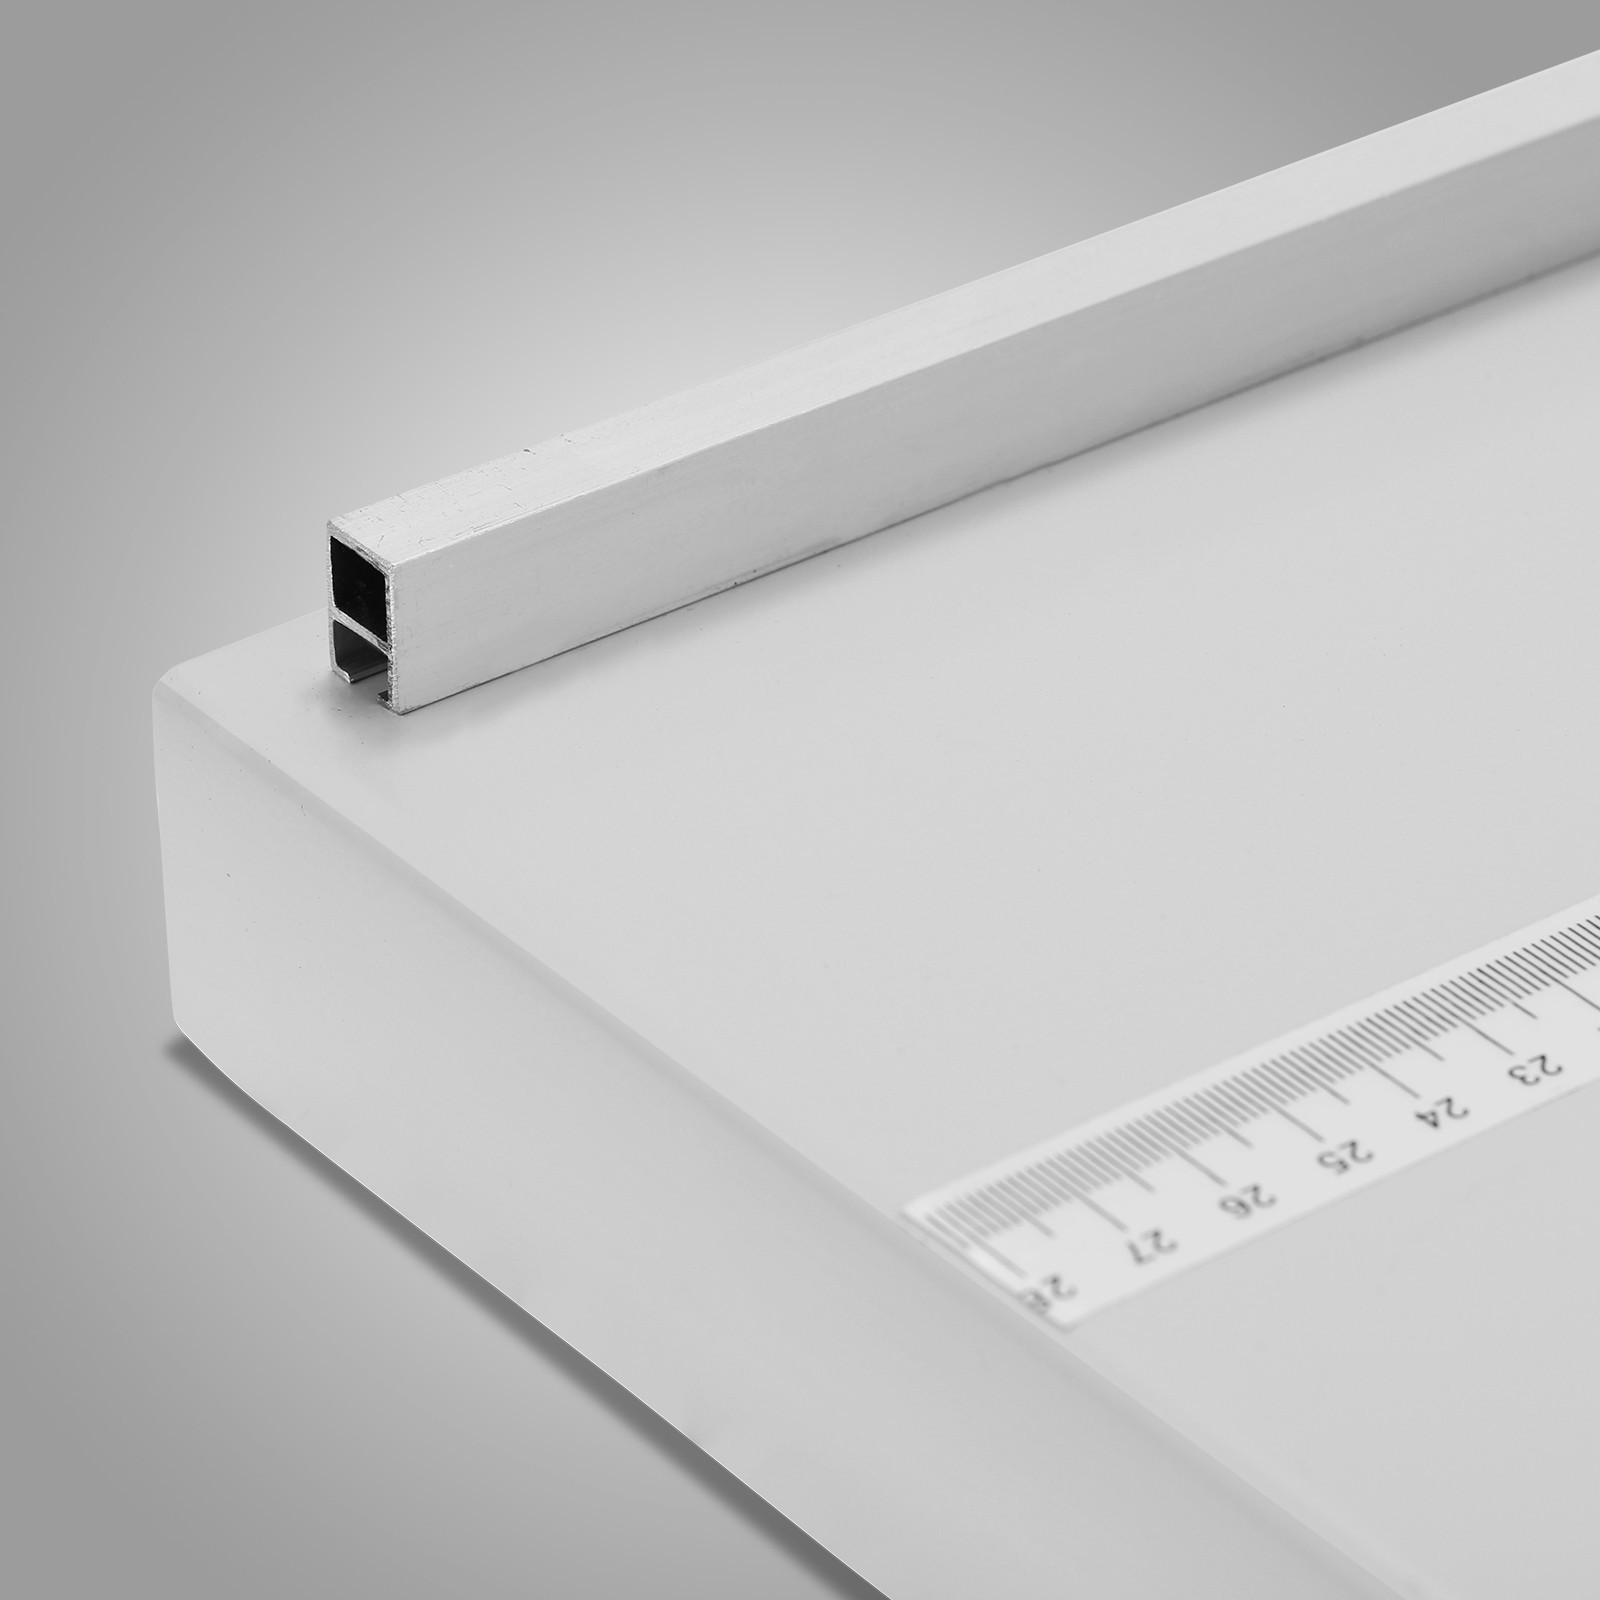 Cordonatrice-Perforatrice-Max-350-520mm-Profondita-Regolabile-Elettrica-Manuale miniatura 42